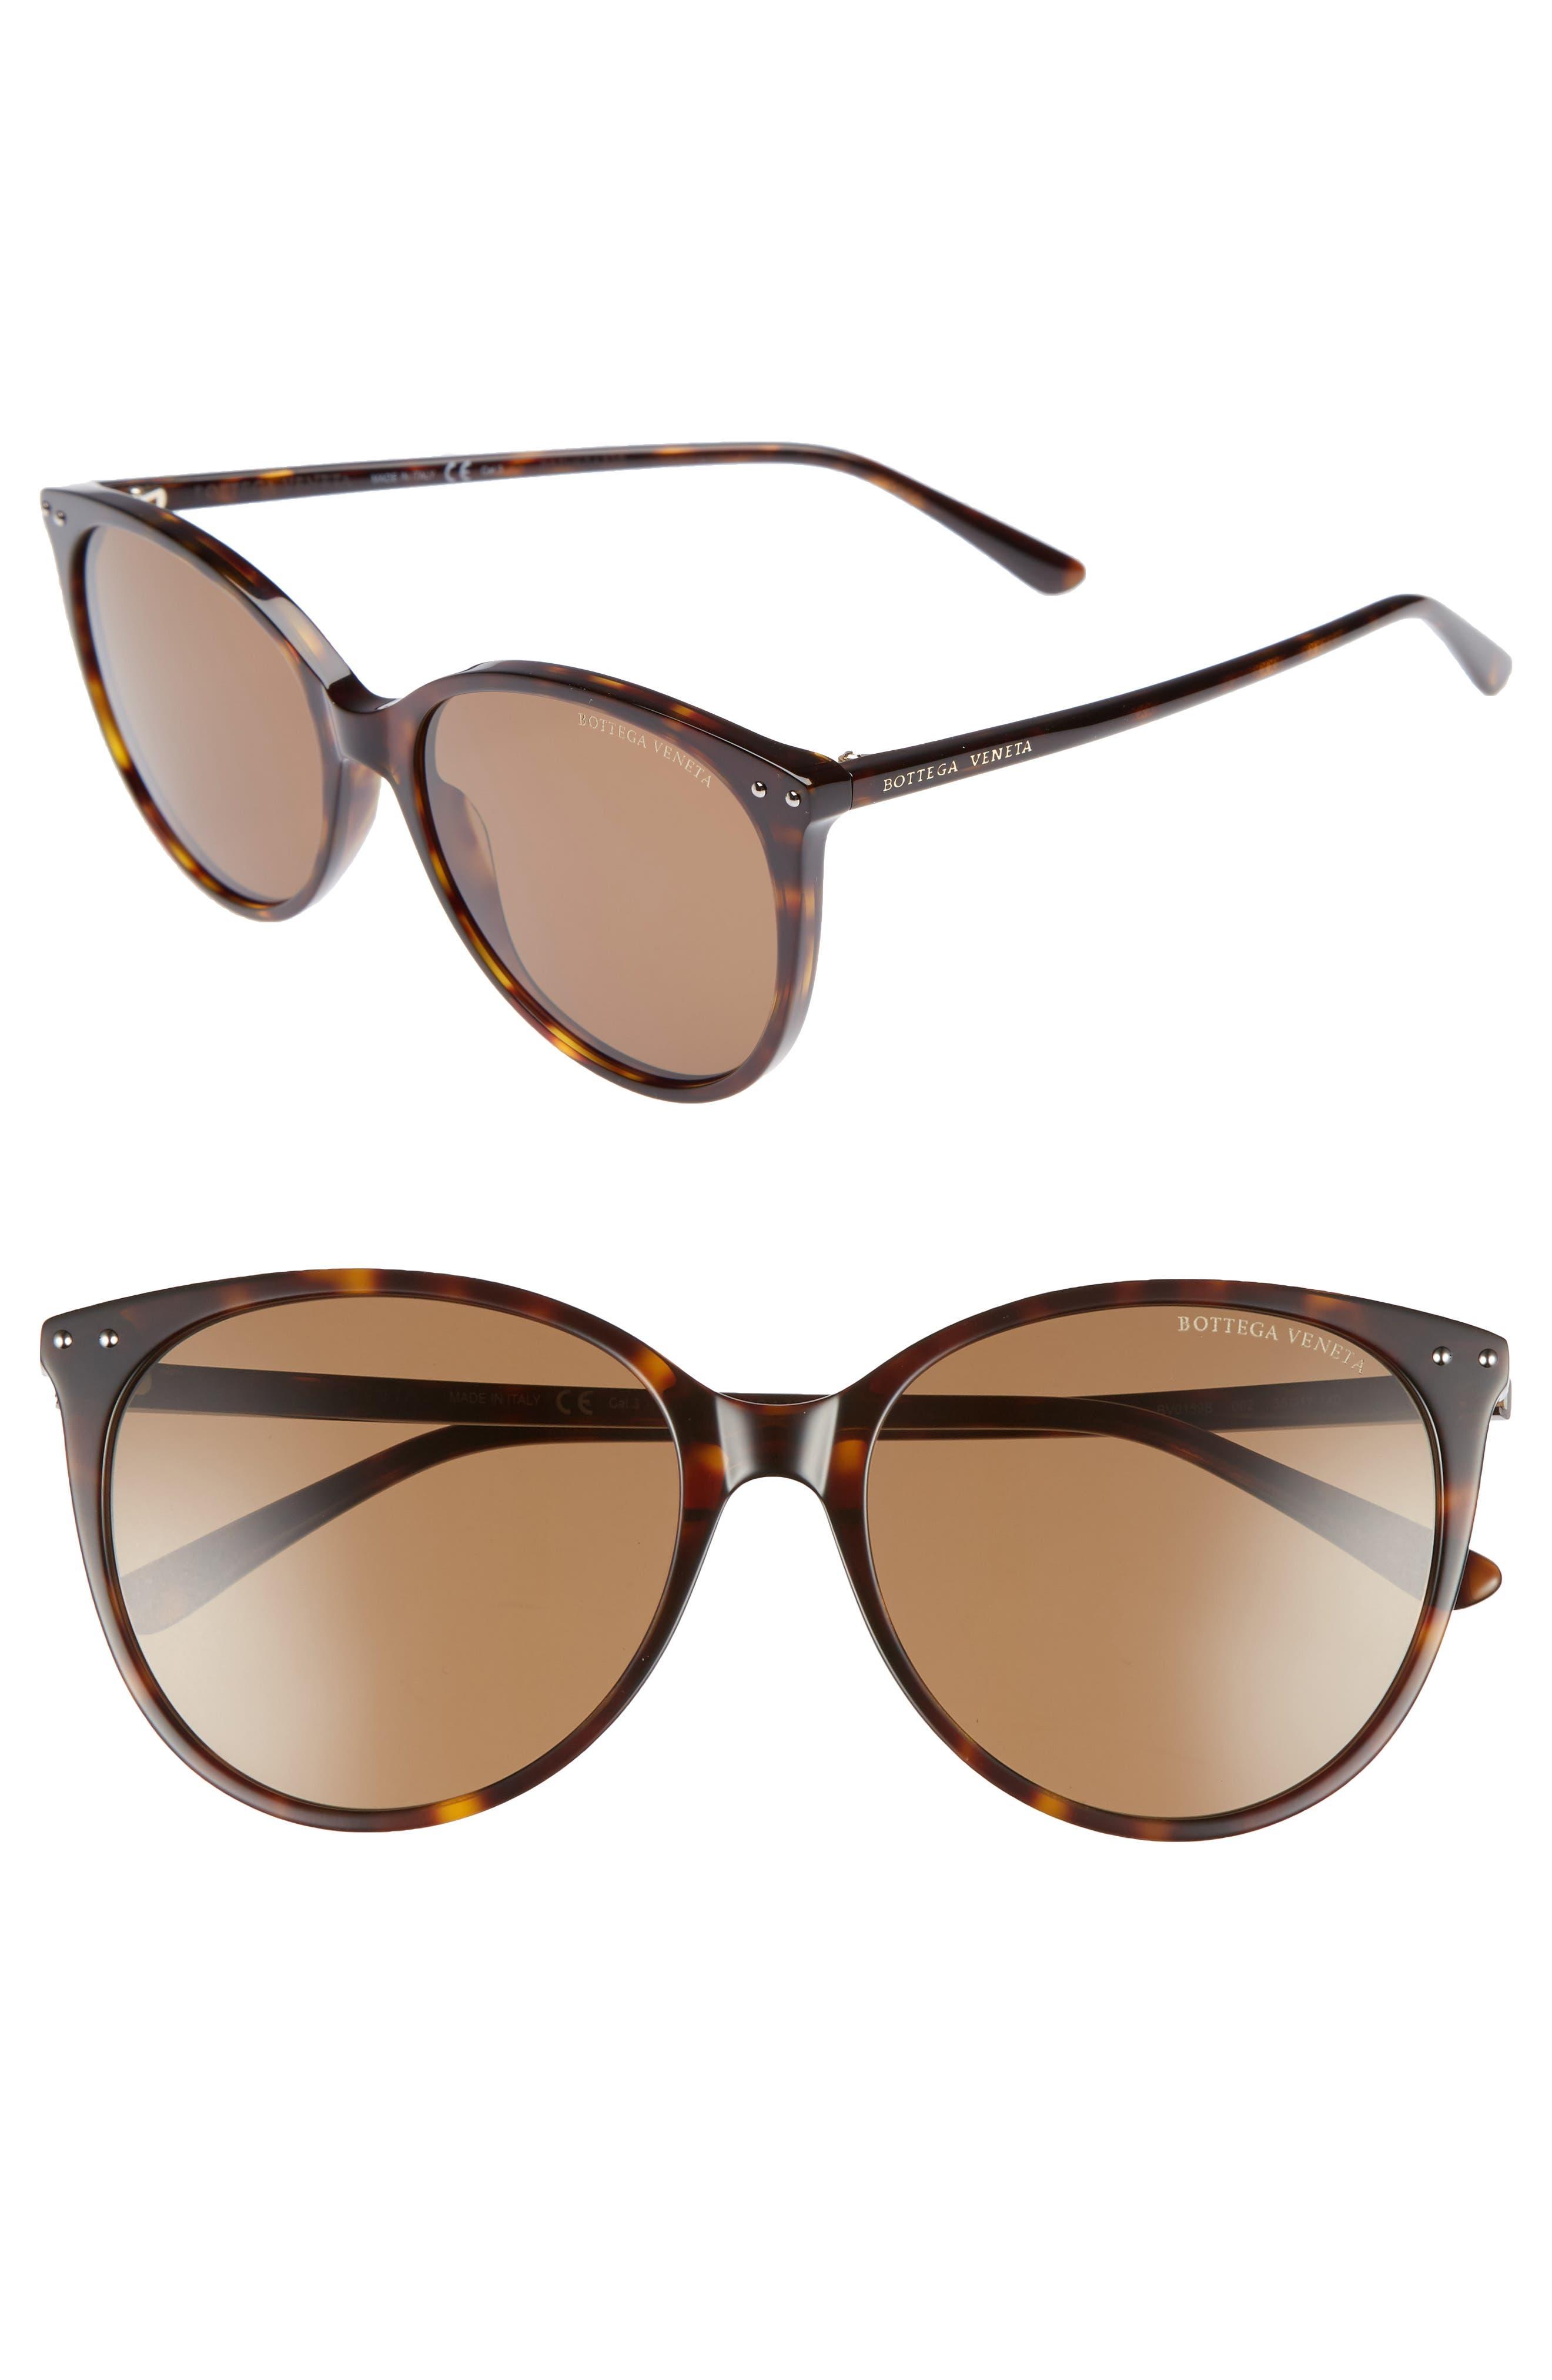 55mm Cat Eye Sunglasses,                             Main thumbnail 1, color,                             DARK HAVANA